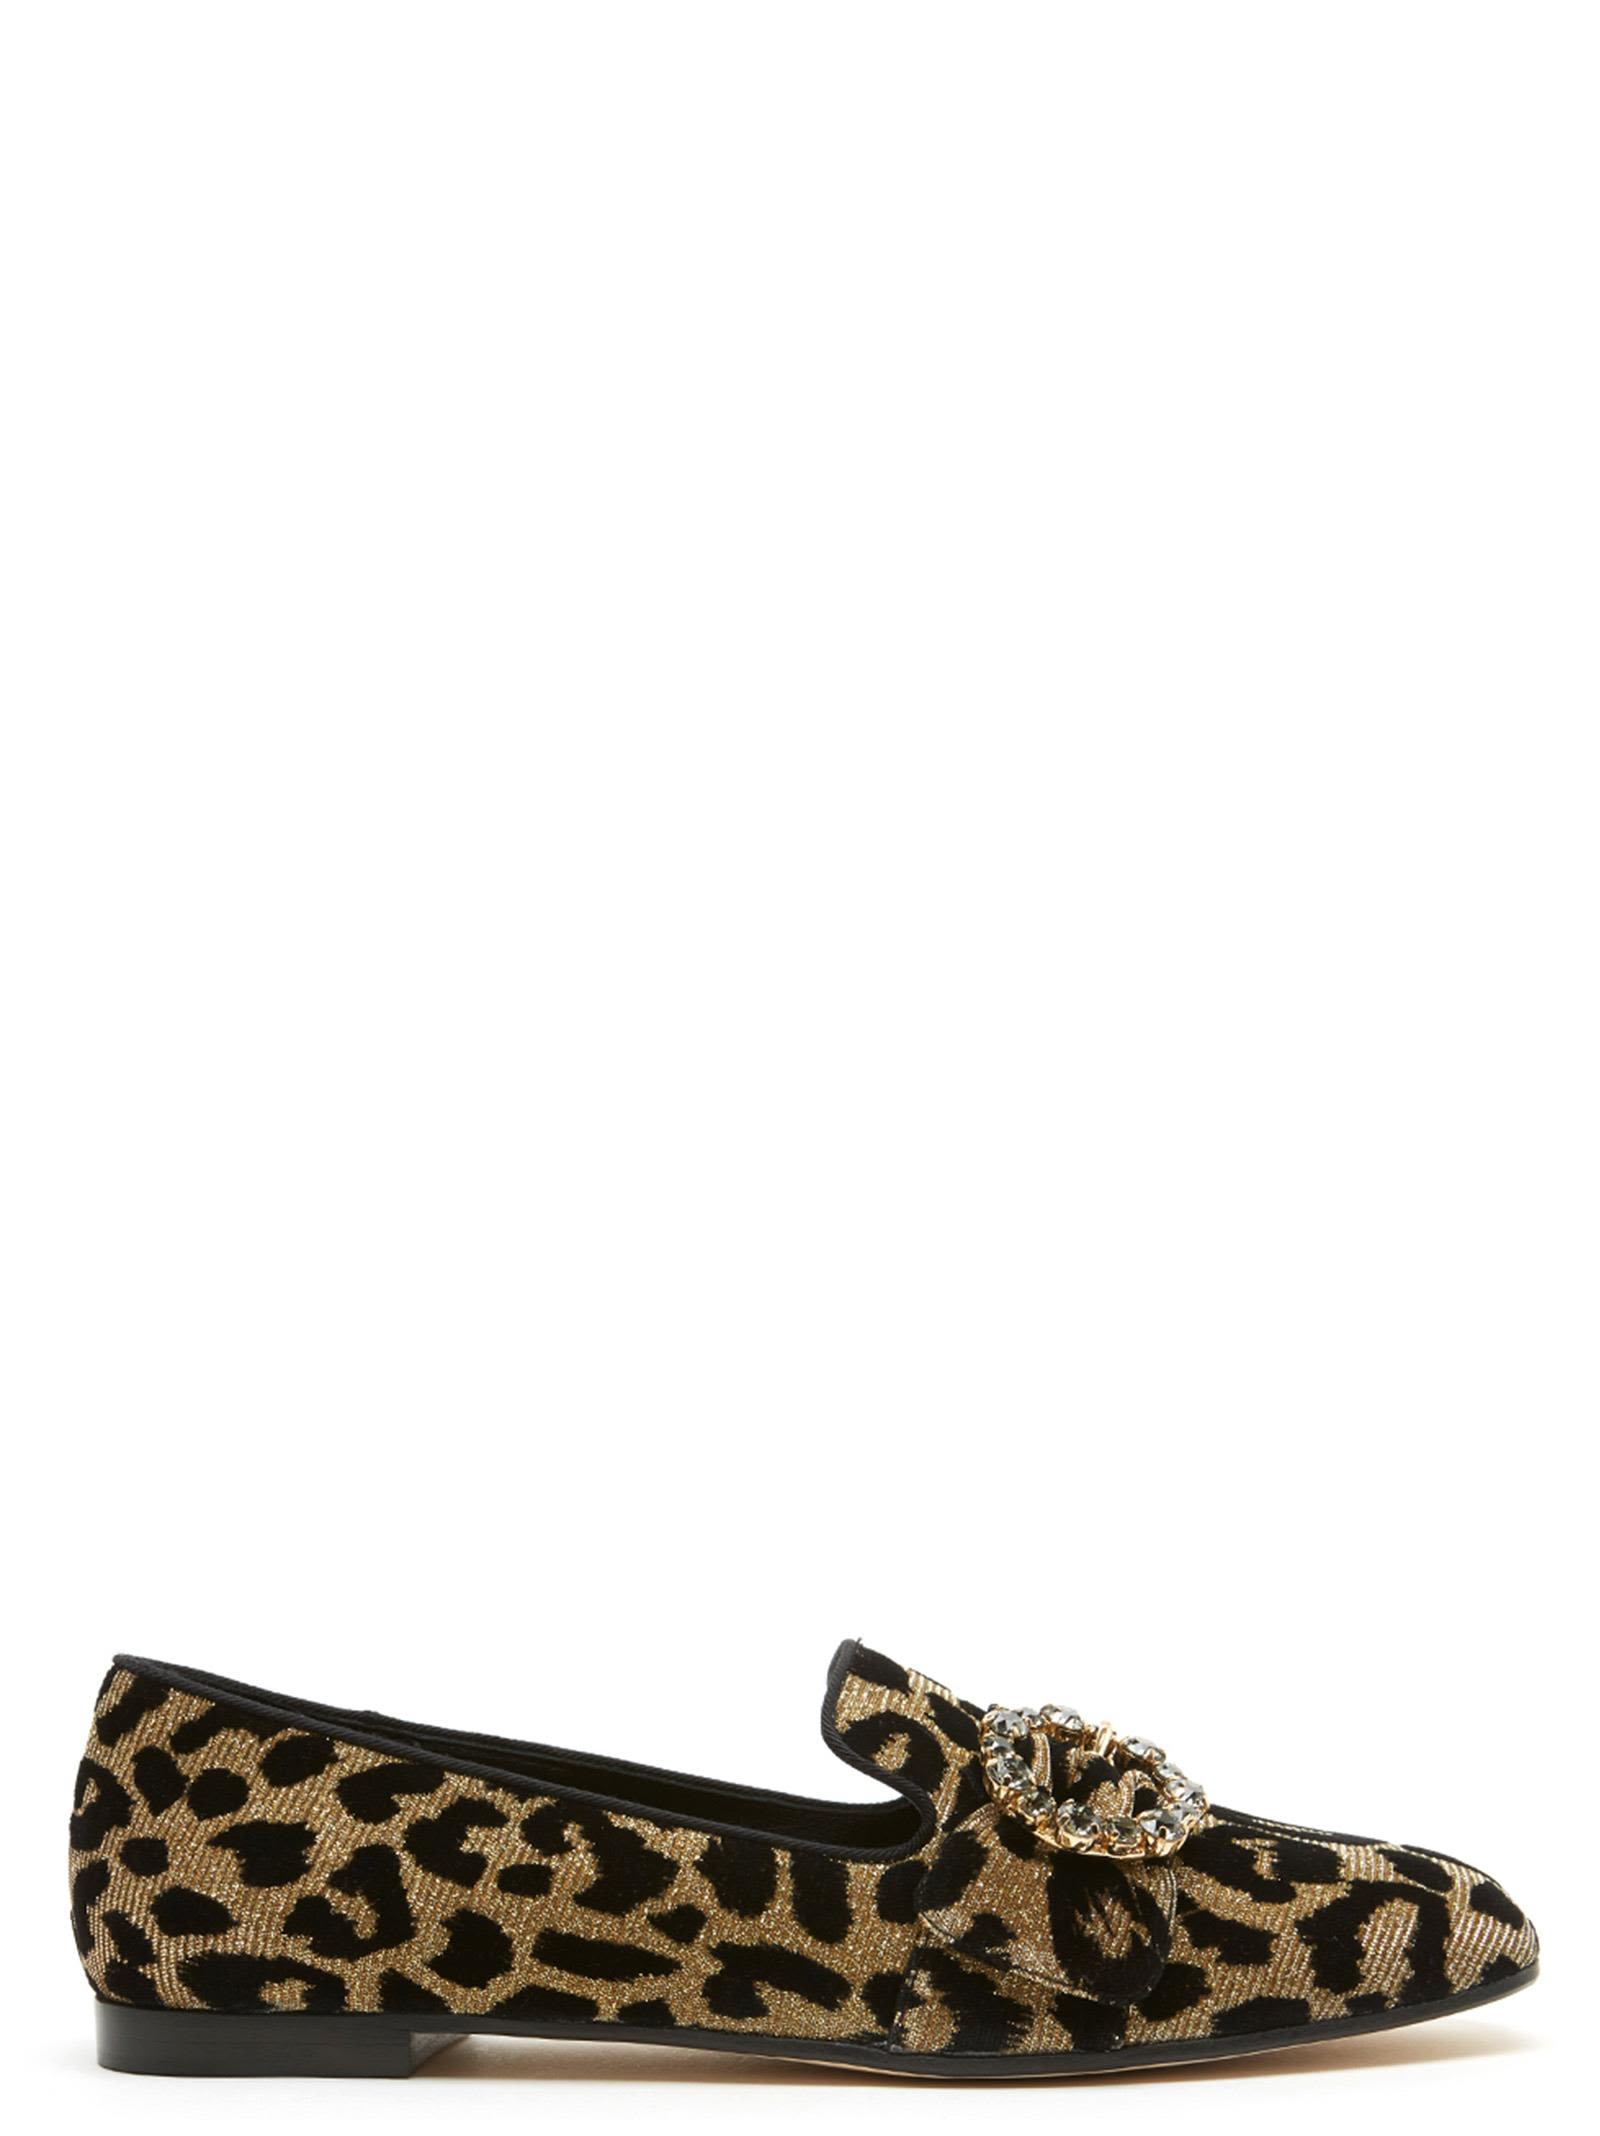 e42f096f0202 Dolce   Gabbana Dolce   Gabbana  jackie  Shoes - Multicolor ...